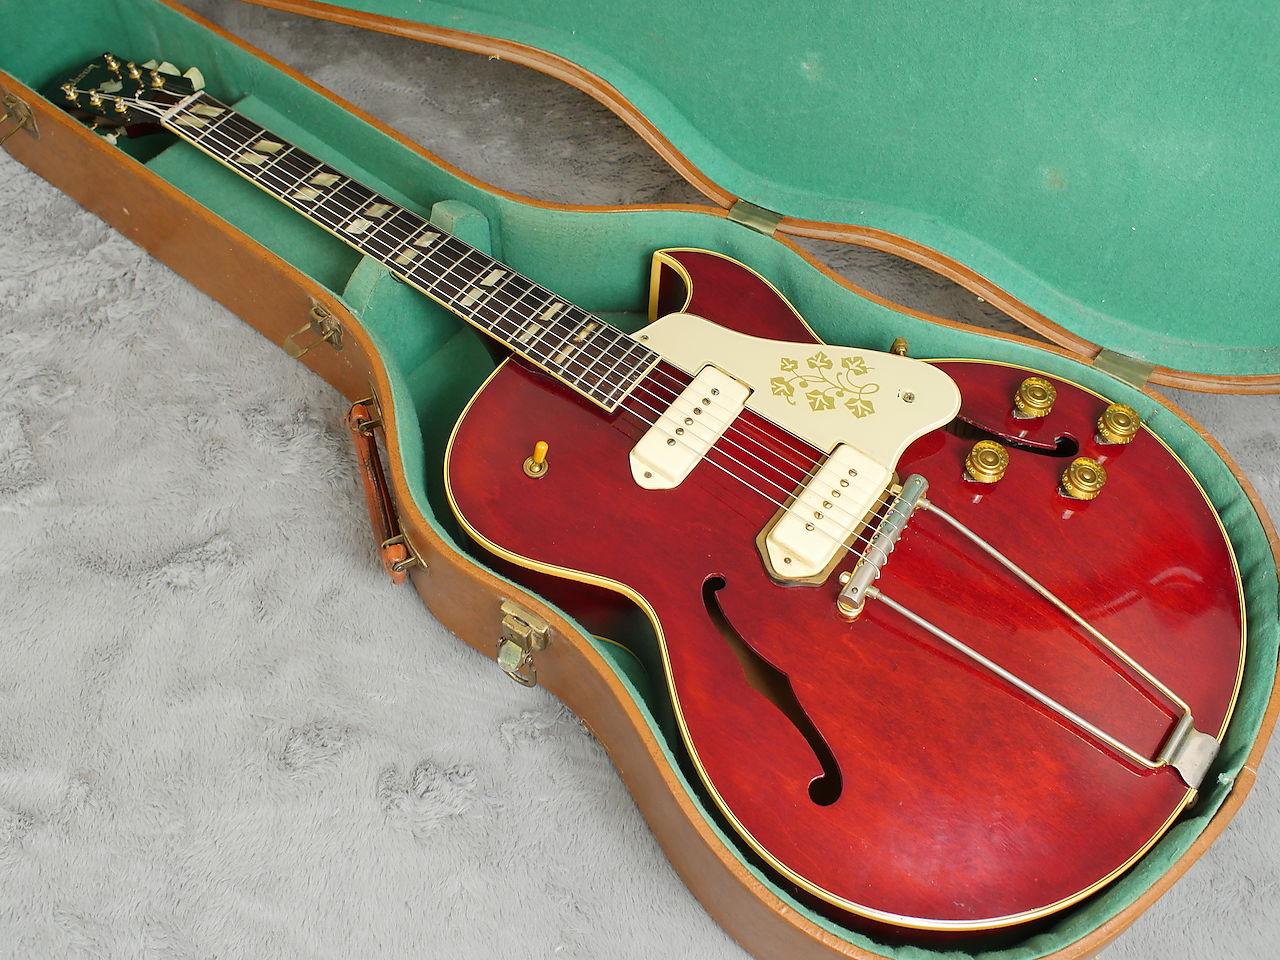 1955 GIBSON ES-295 CHERRY RED